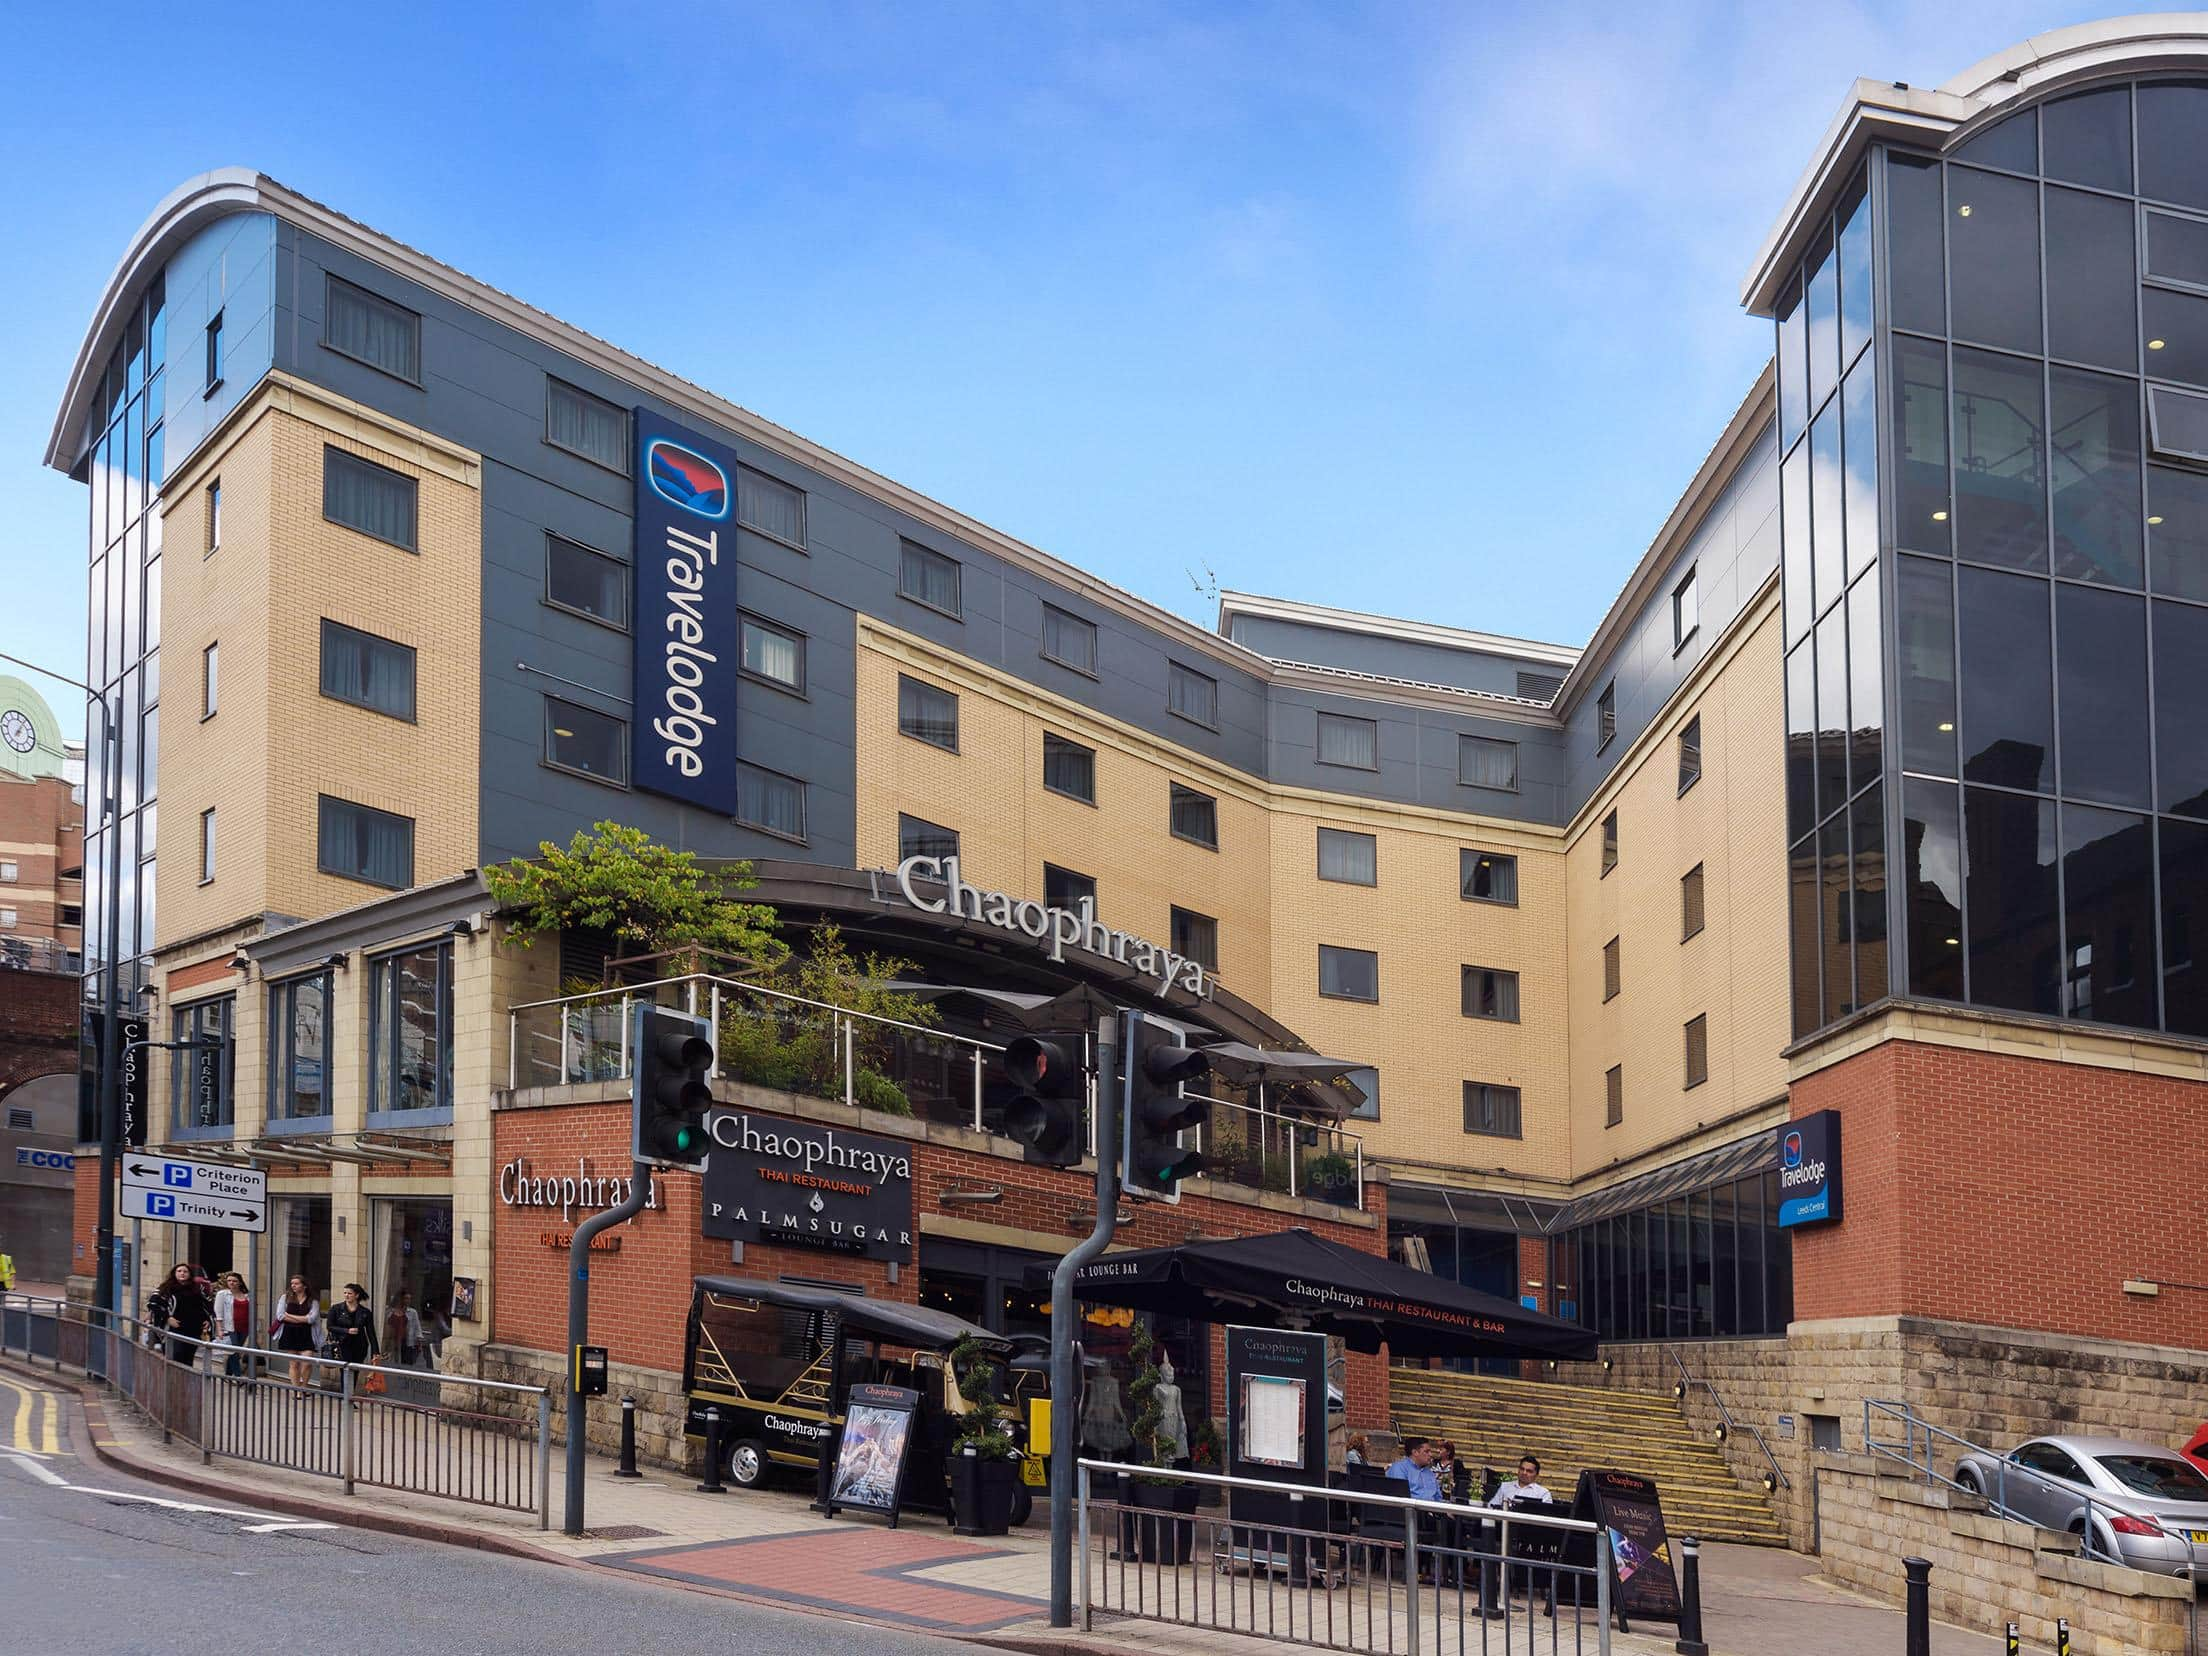 Leeds Central - Exterior